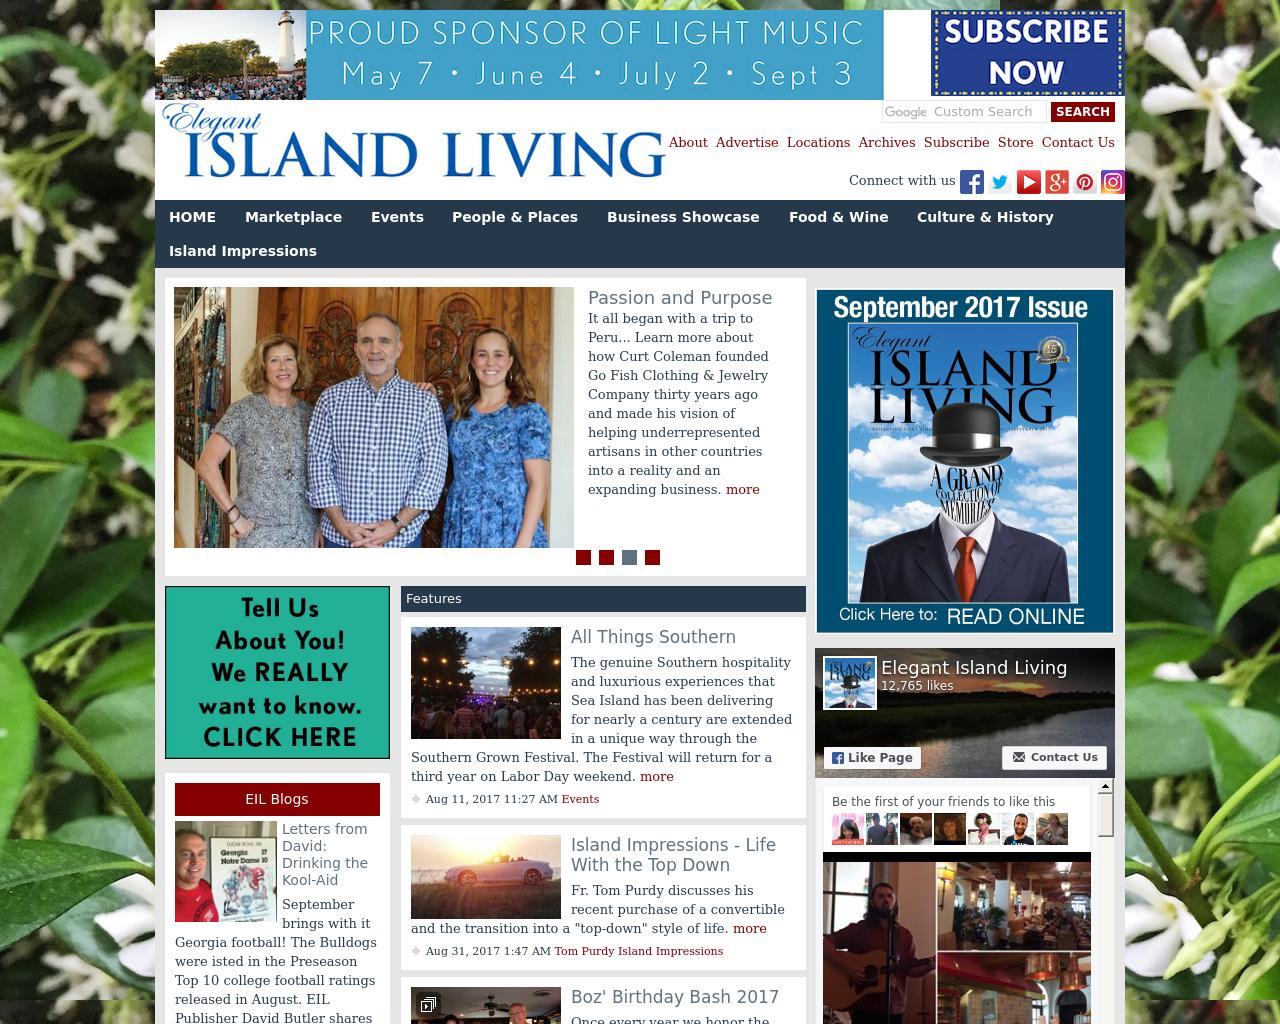 Elegant-Island-Living-Advertising-Reviews-Pricing